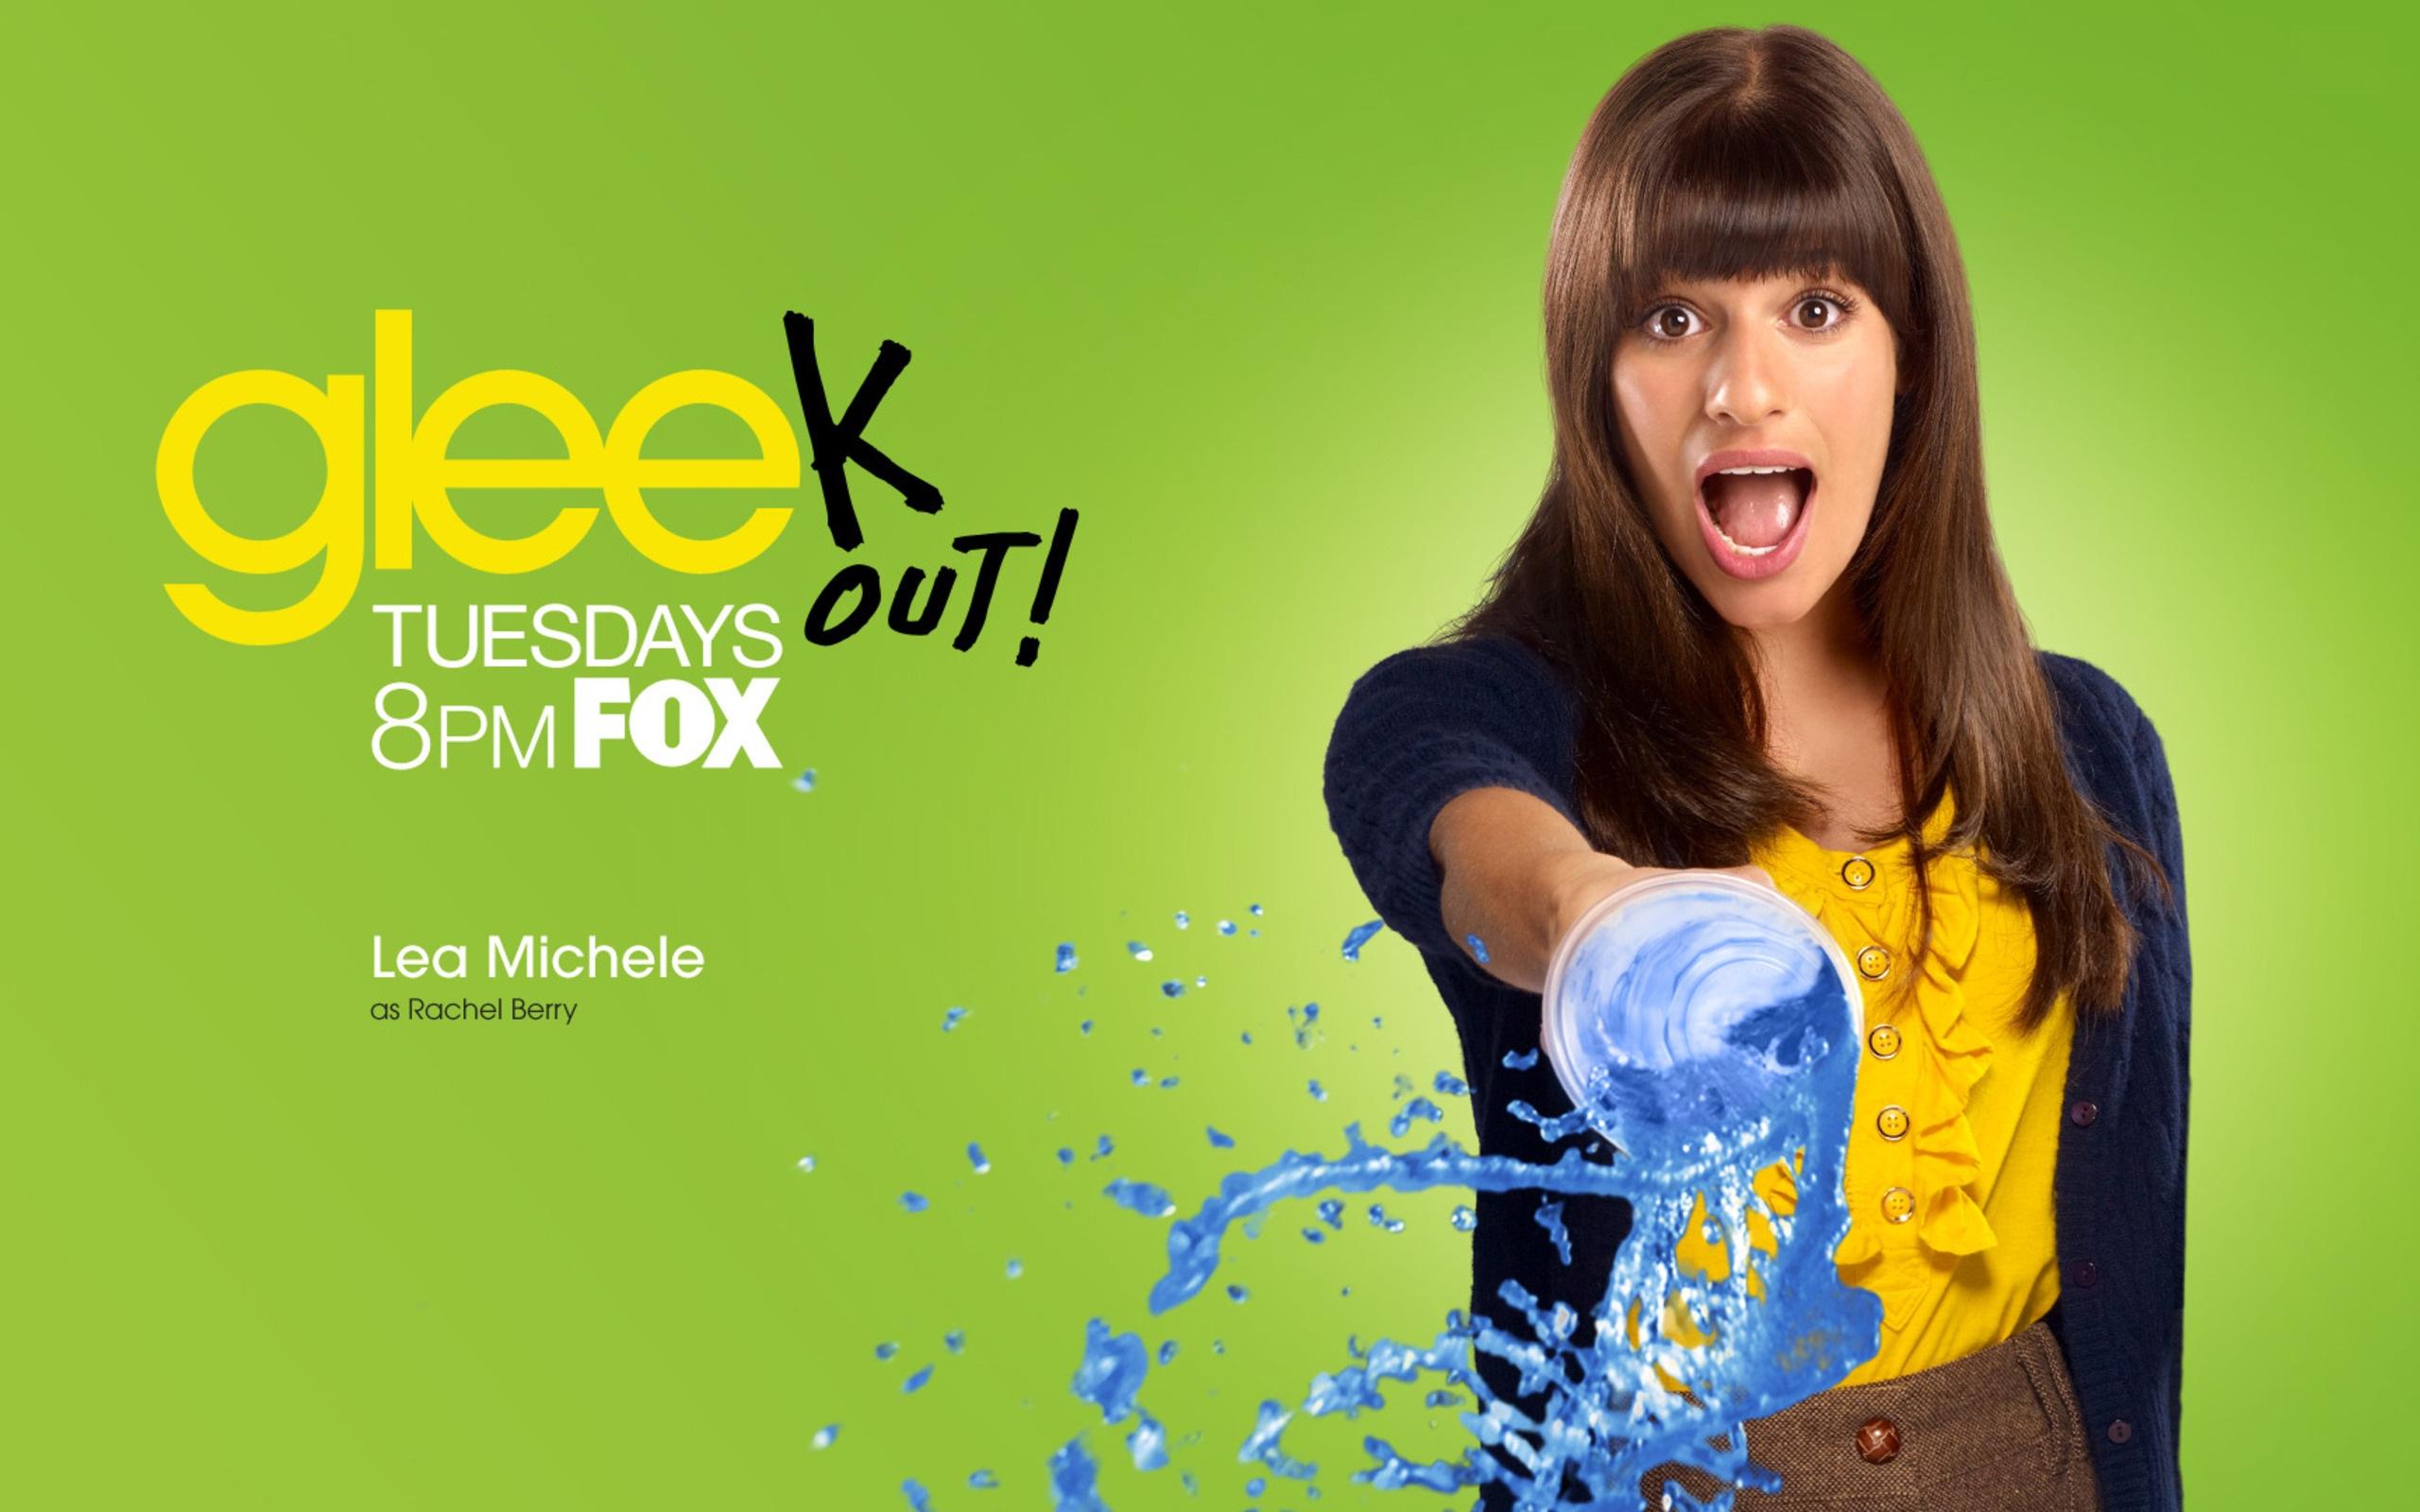 Glee wallpaper 14